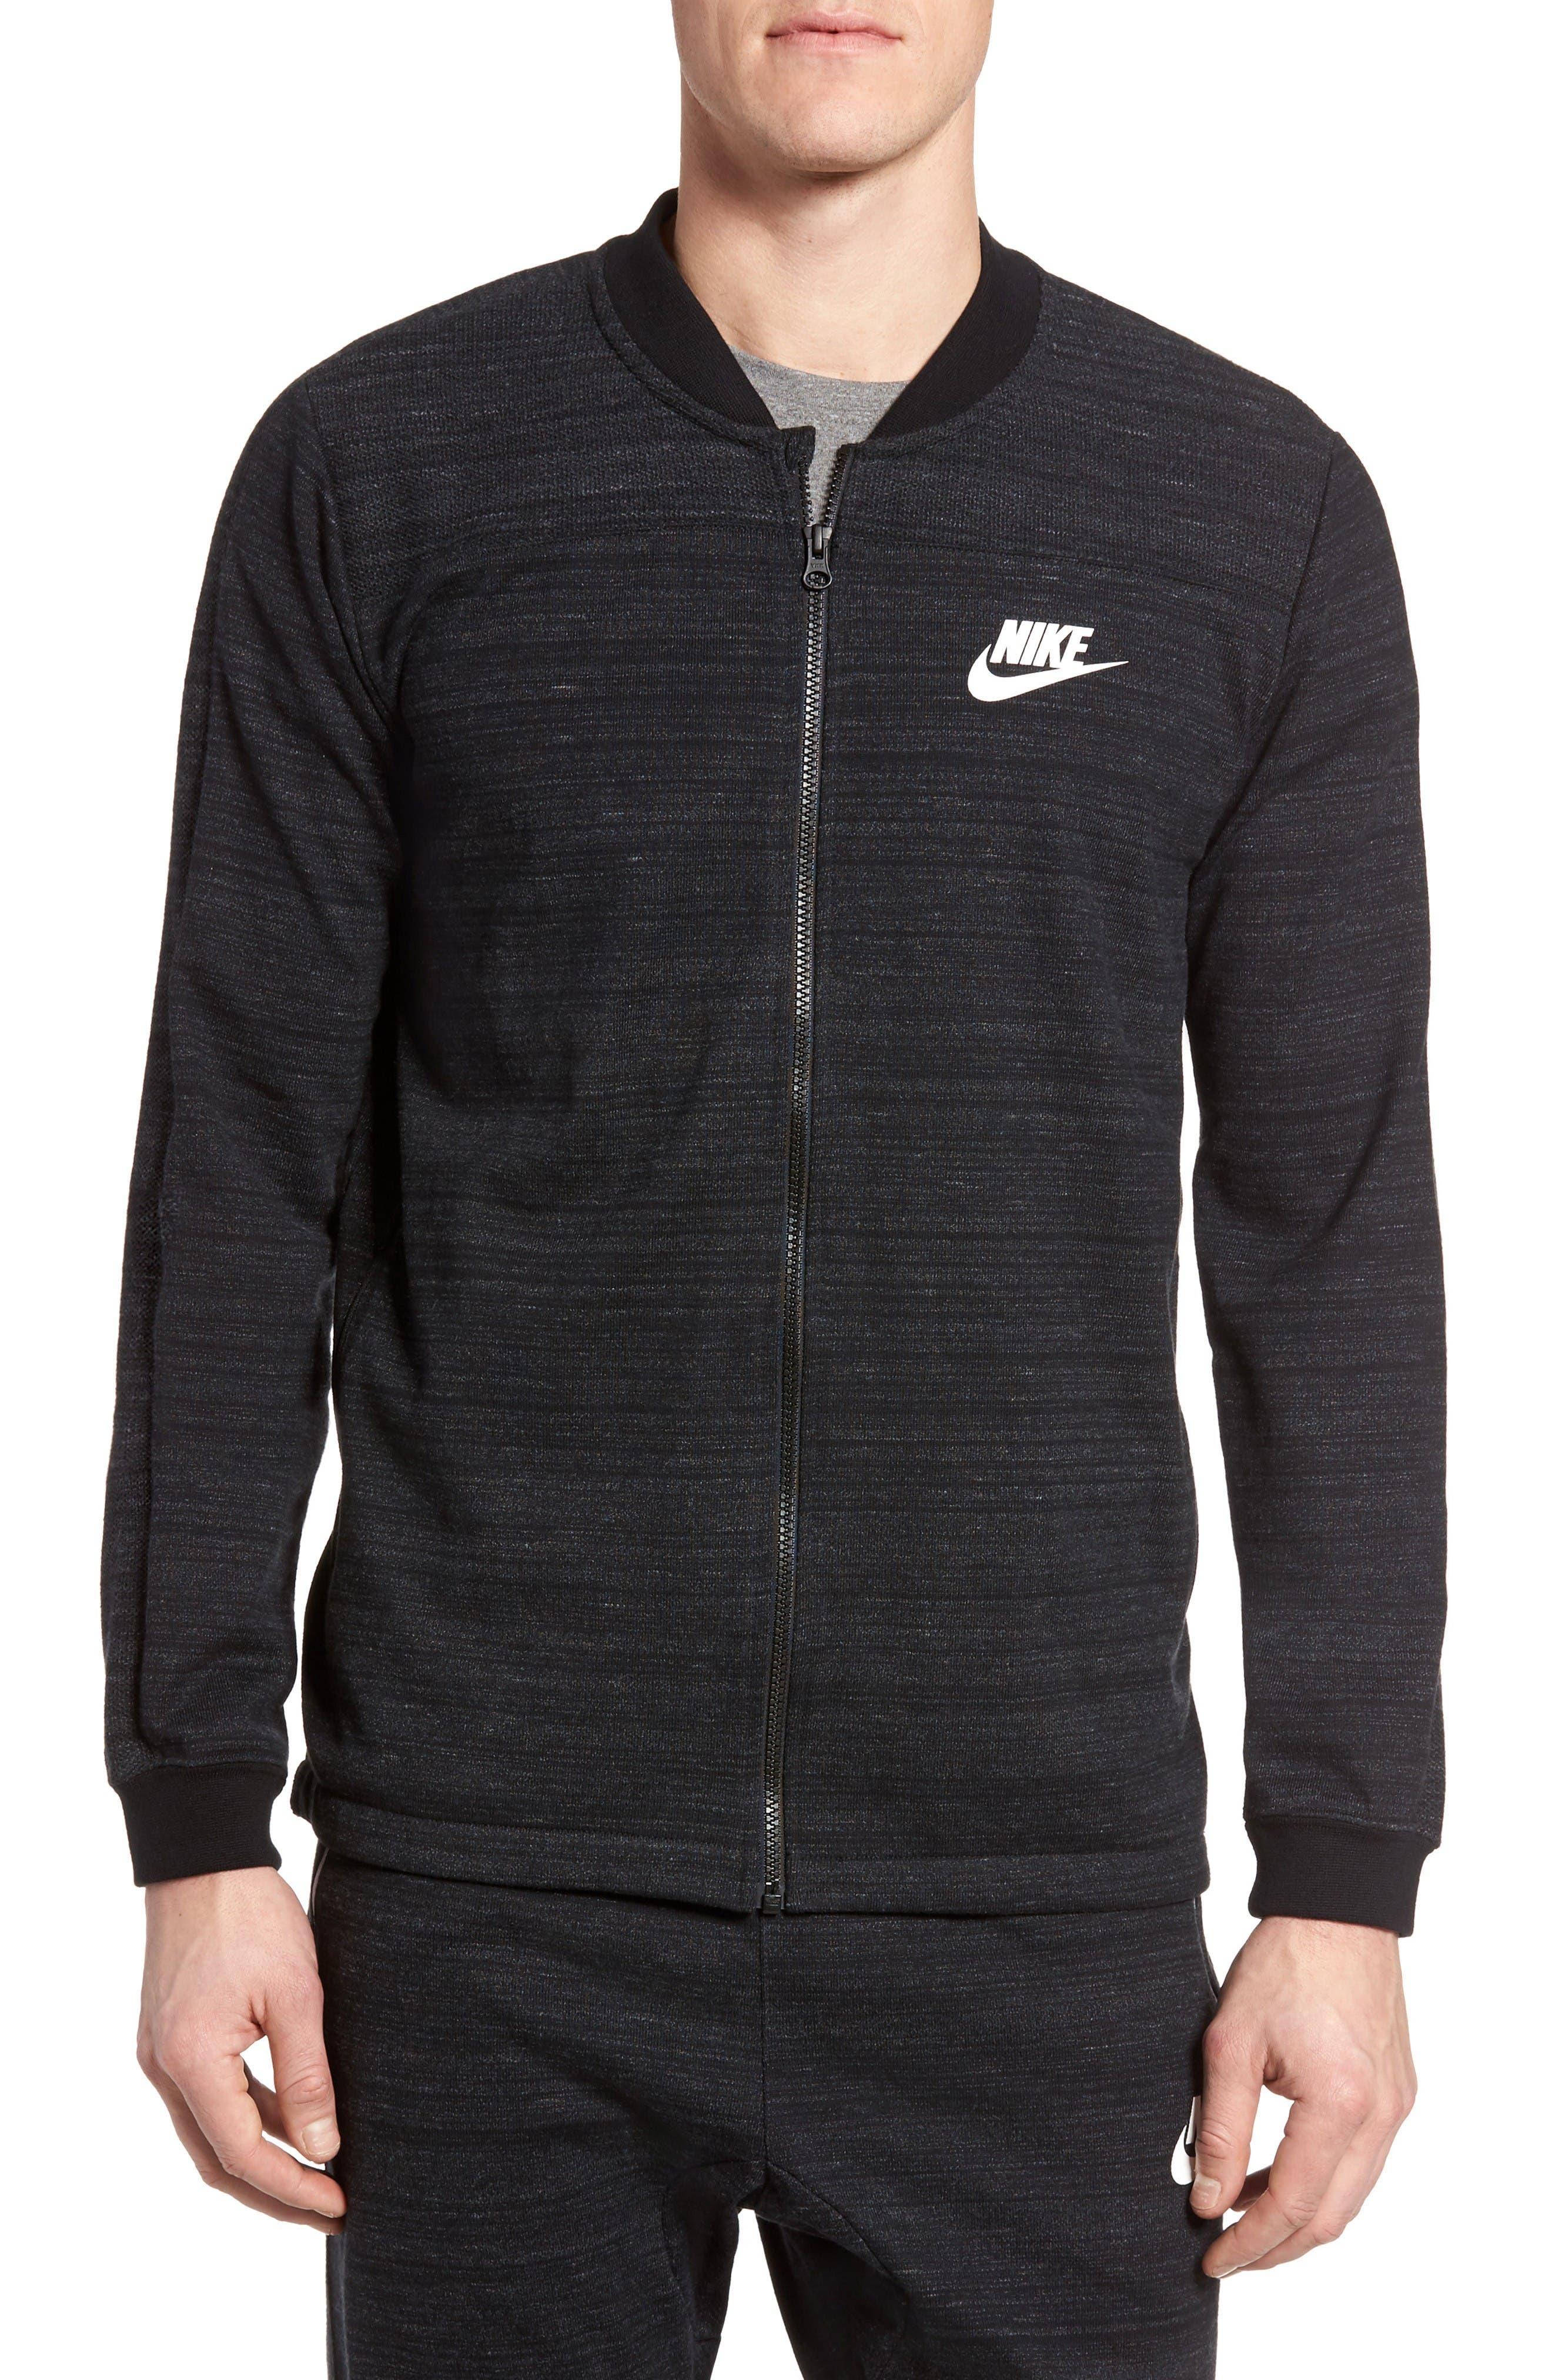 Nike Advance 15 Jacket